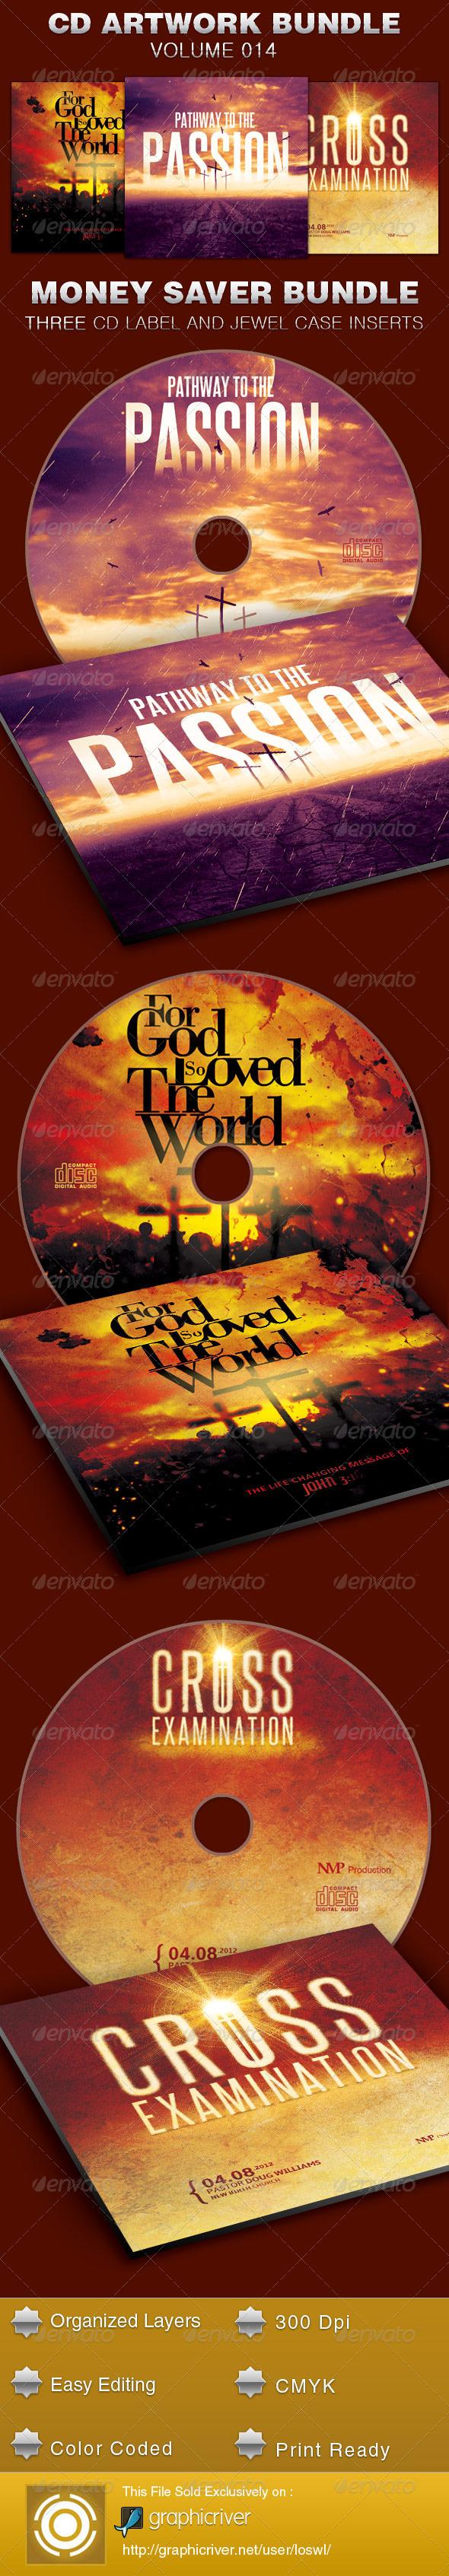 CD Cover Artwork Template Bundle-Vol 014 - CD & DVD Artwork Print Templates